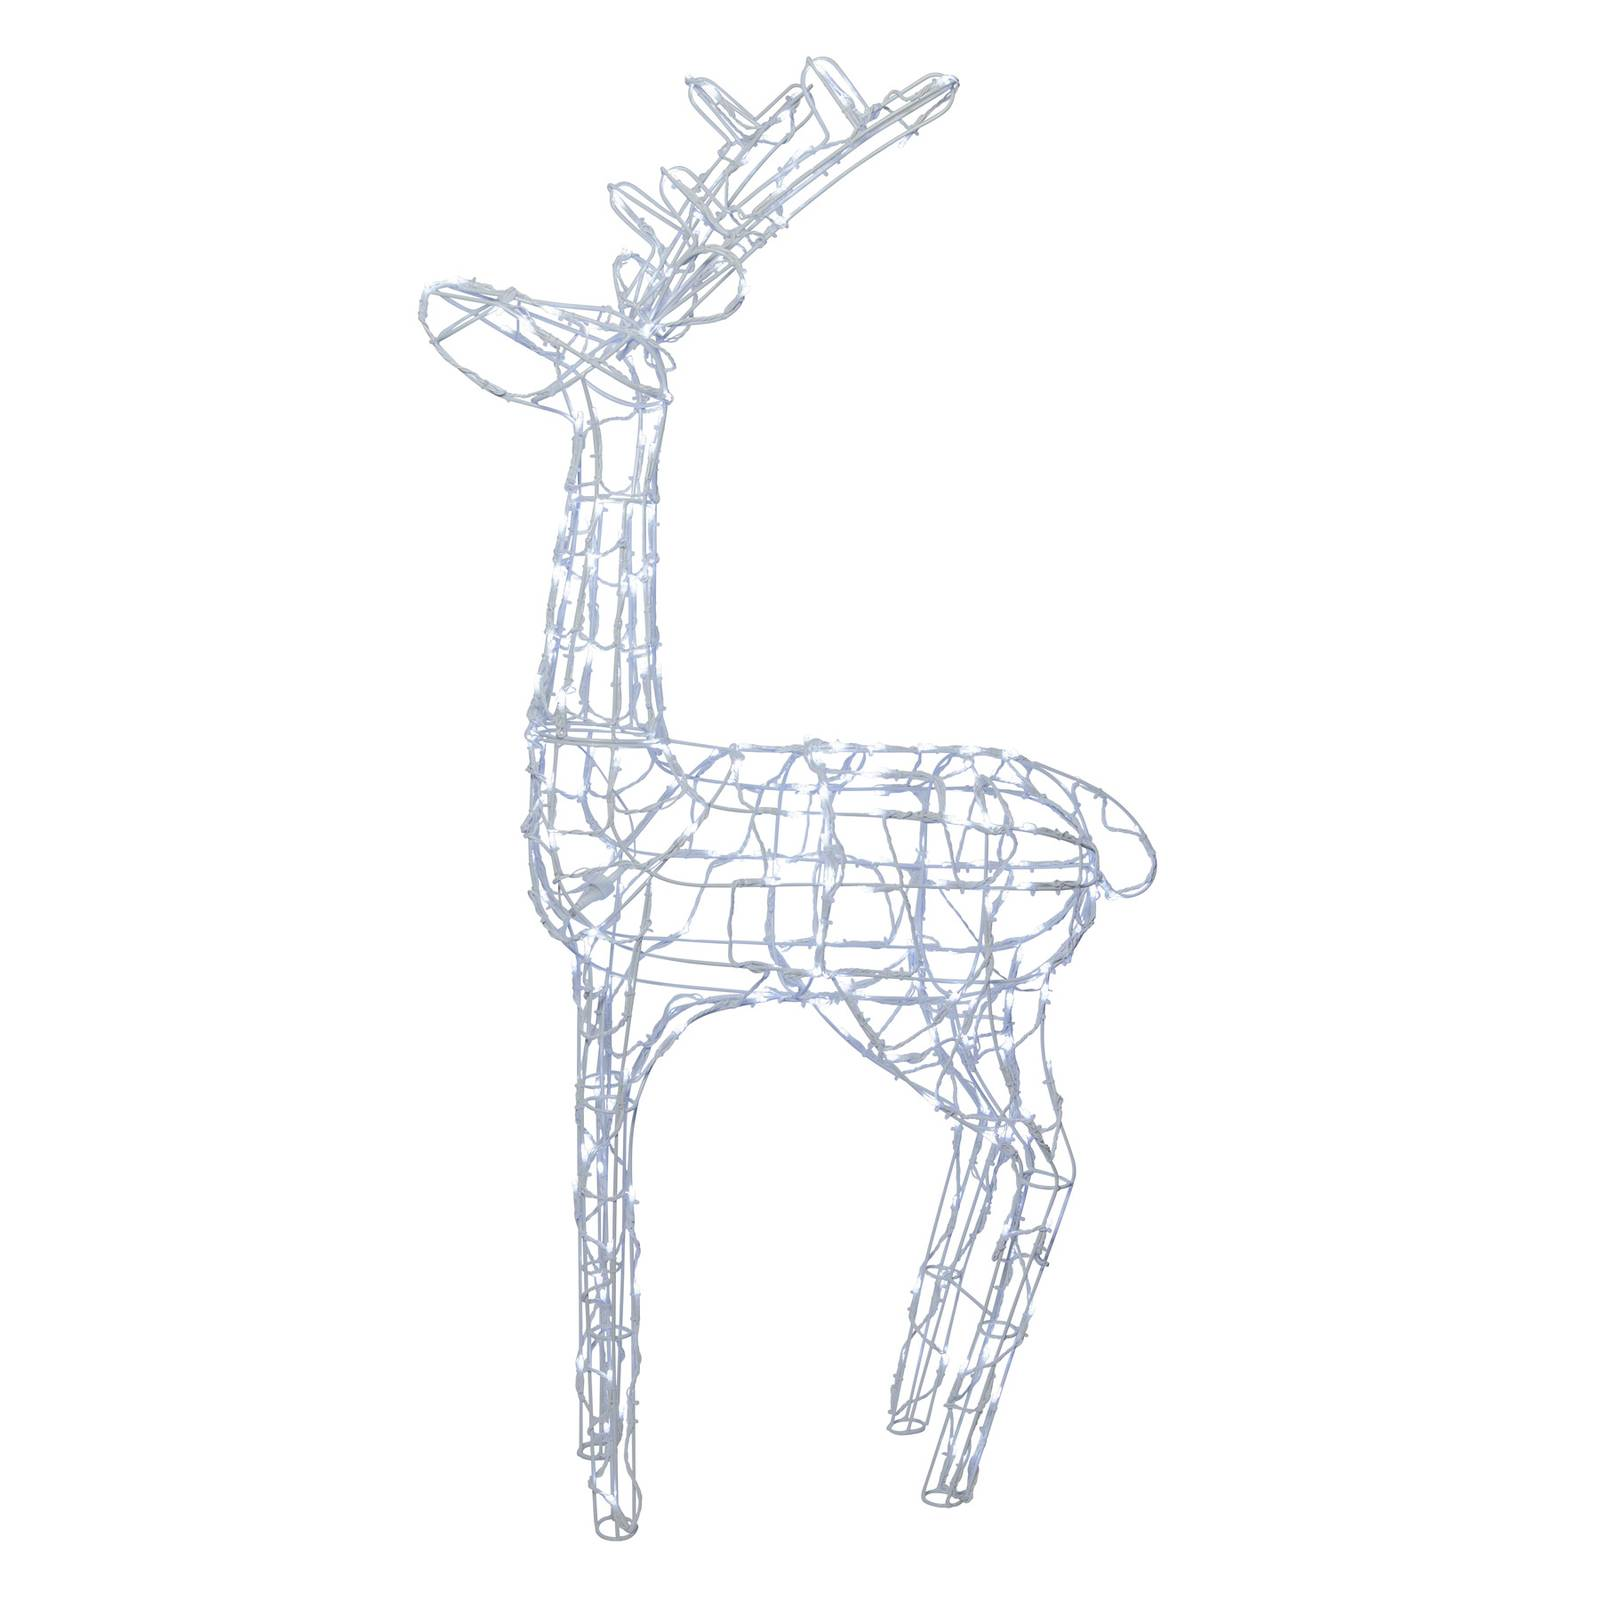 "*For X-Mas*: LED-Leuchtfigur ""Pegasus"" aus Metall, weiß"